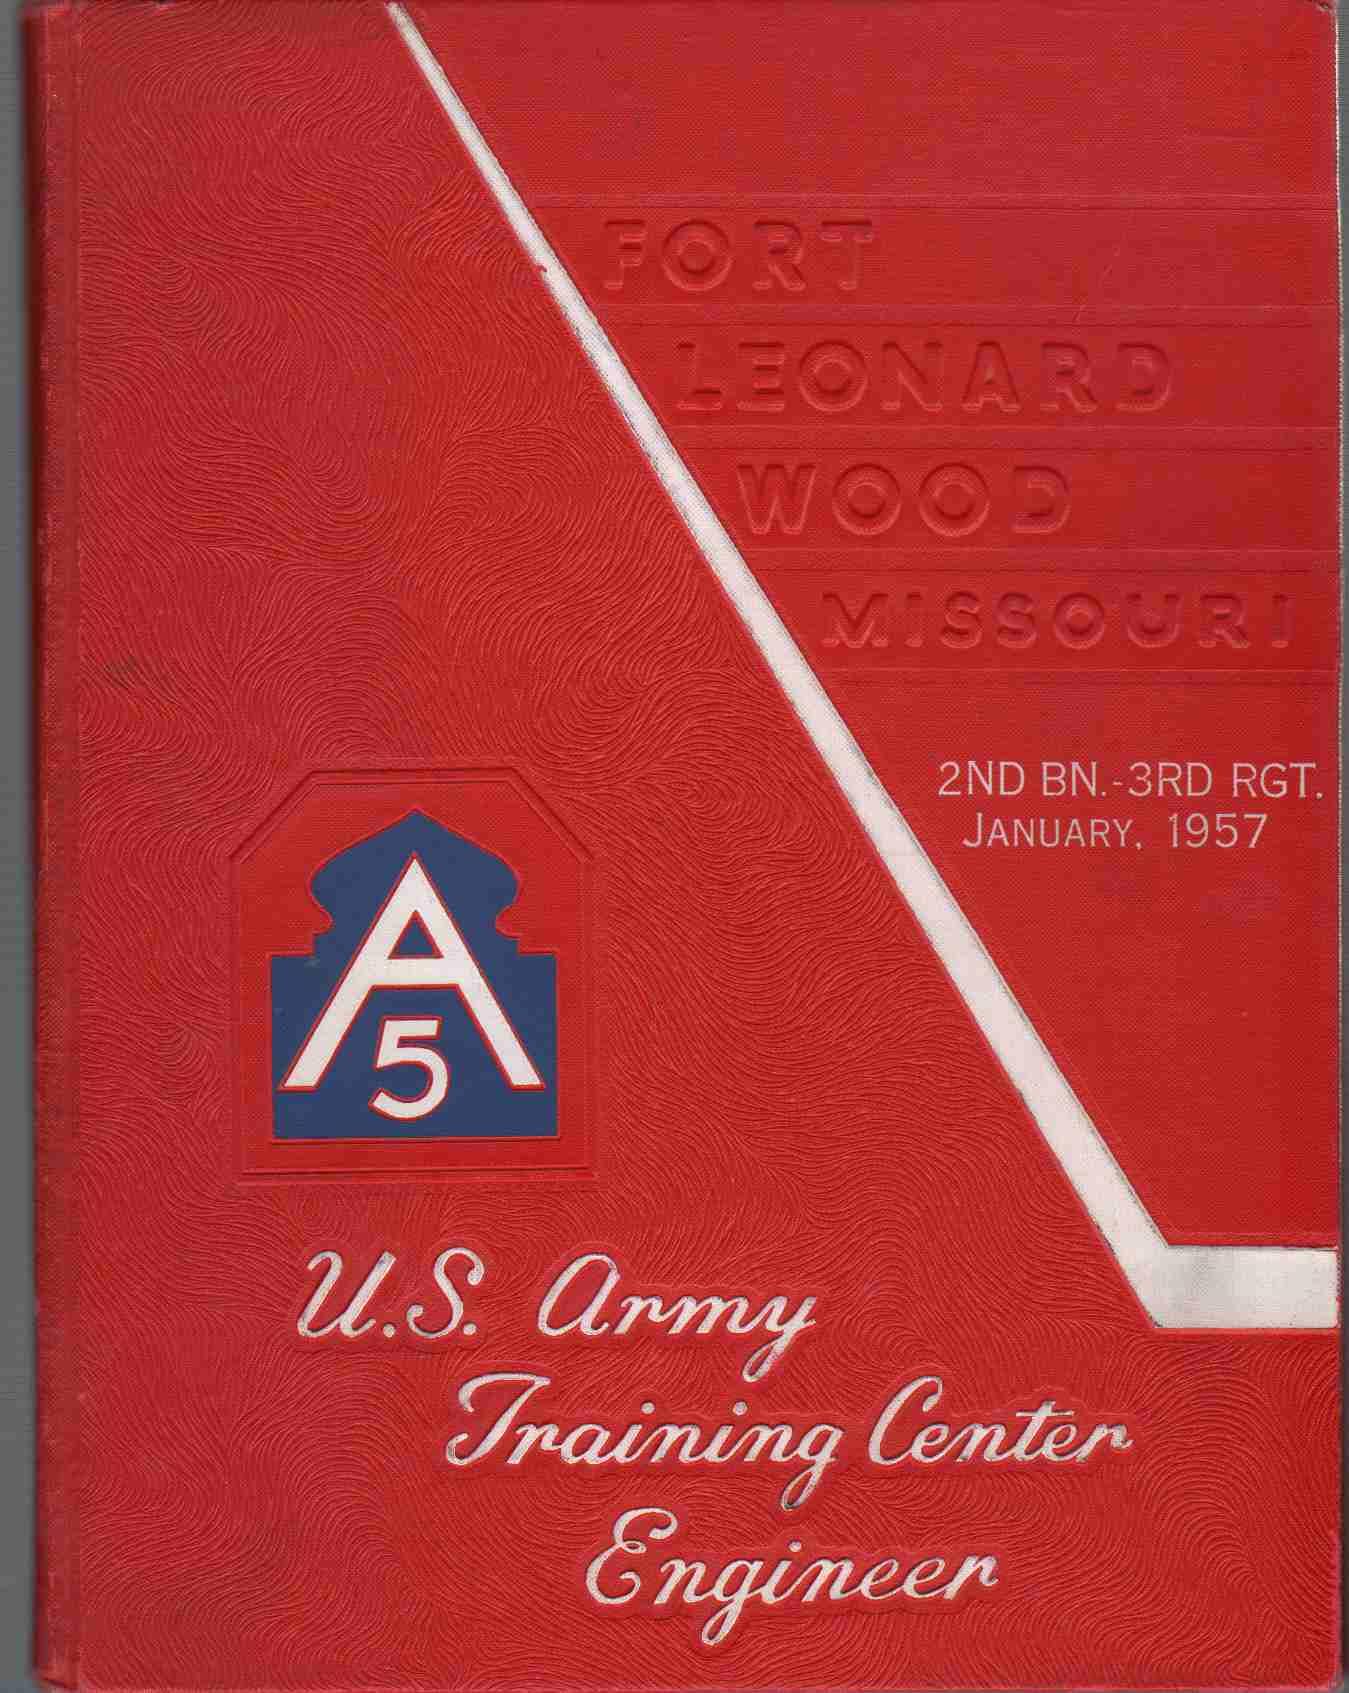 FORT LEONARD WOOD MISSOURI U. S. ARMY TRAINING CENTER ENGINEER 2nd BN. - 3rd RGT. January, 1957, United States Army